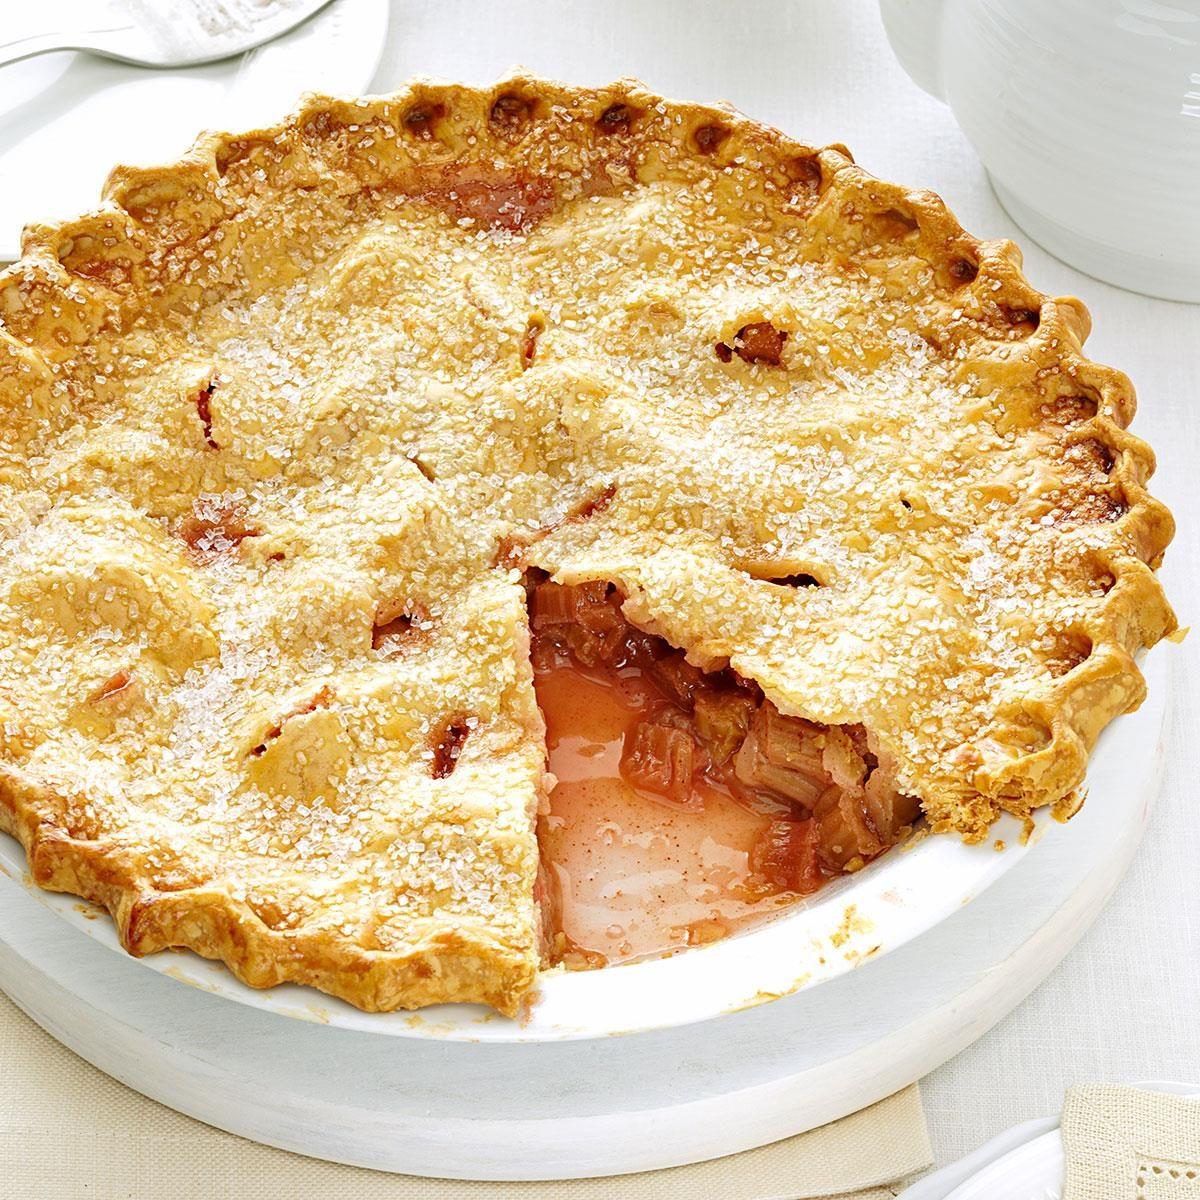 Lemony Rhubarb Pie Recipe | Taste of Home